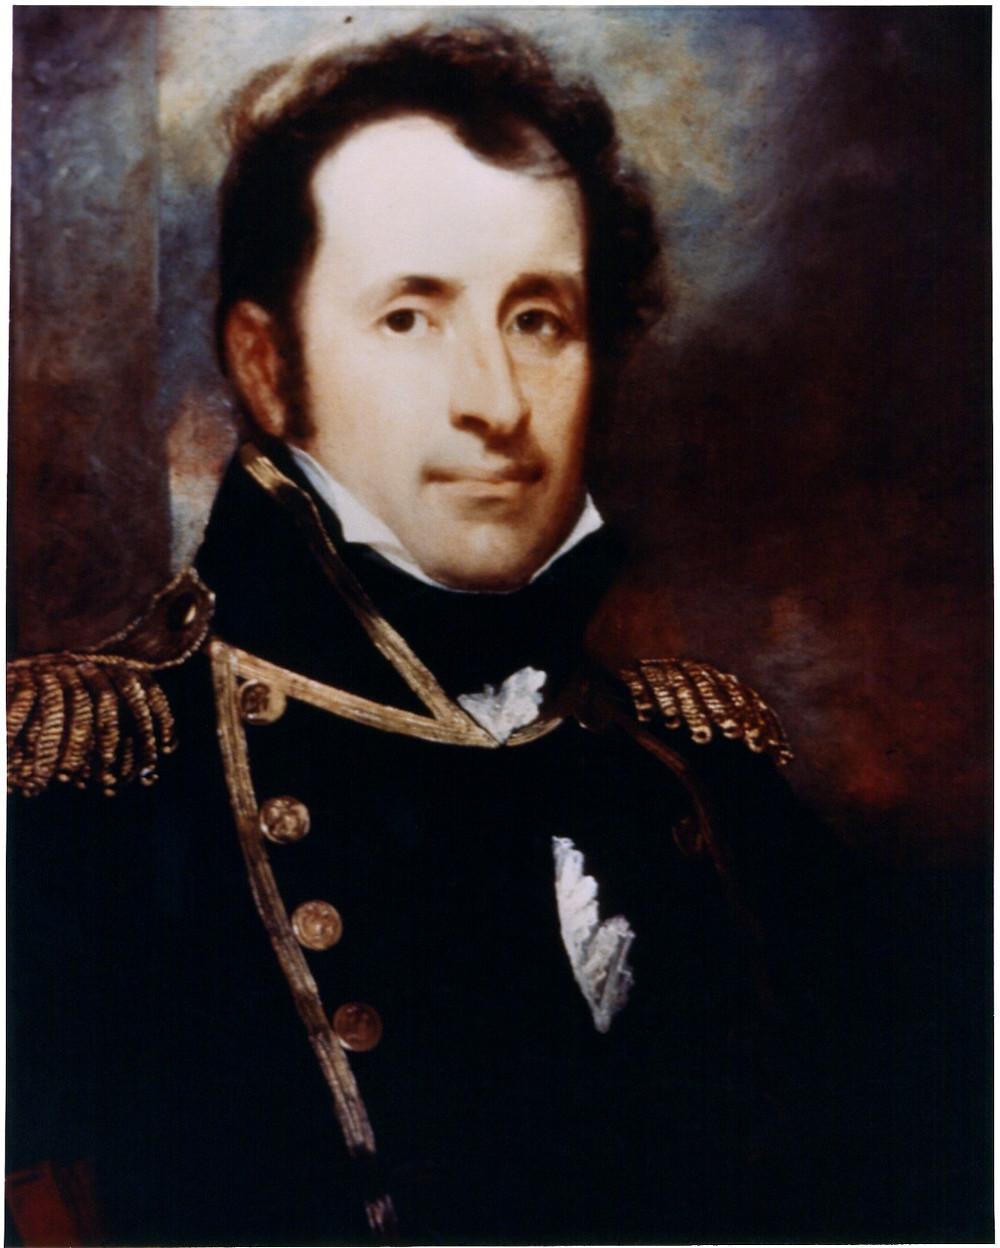 Commodore Stephen Decatur